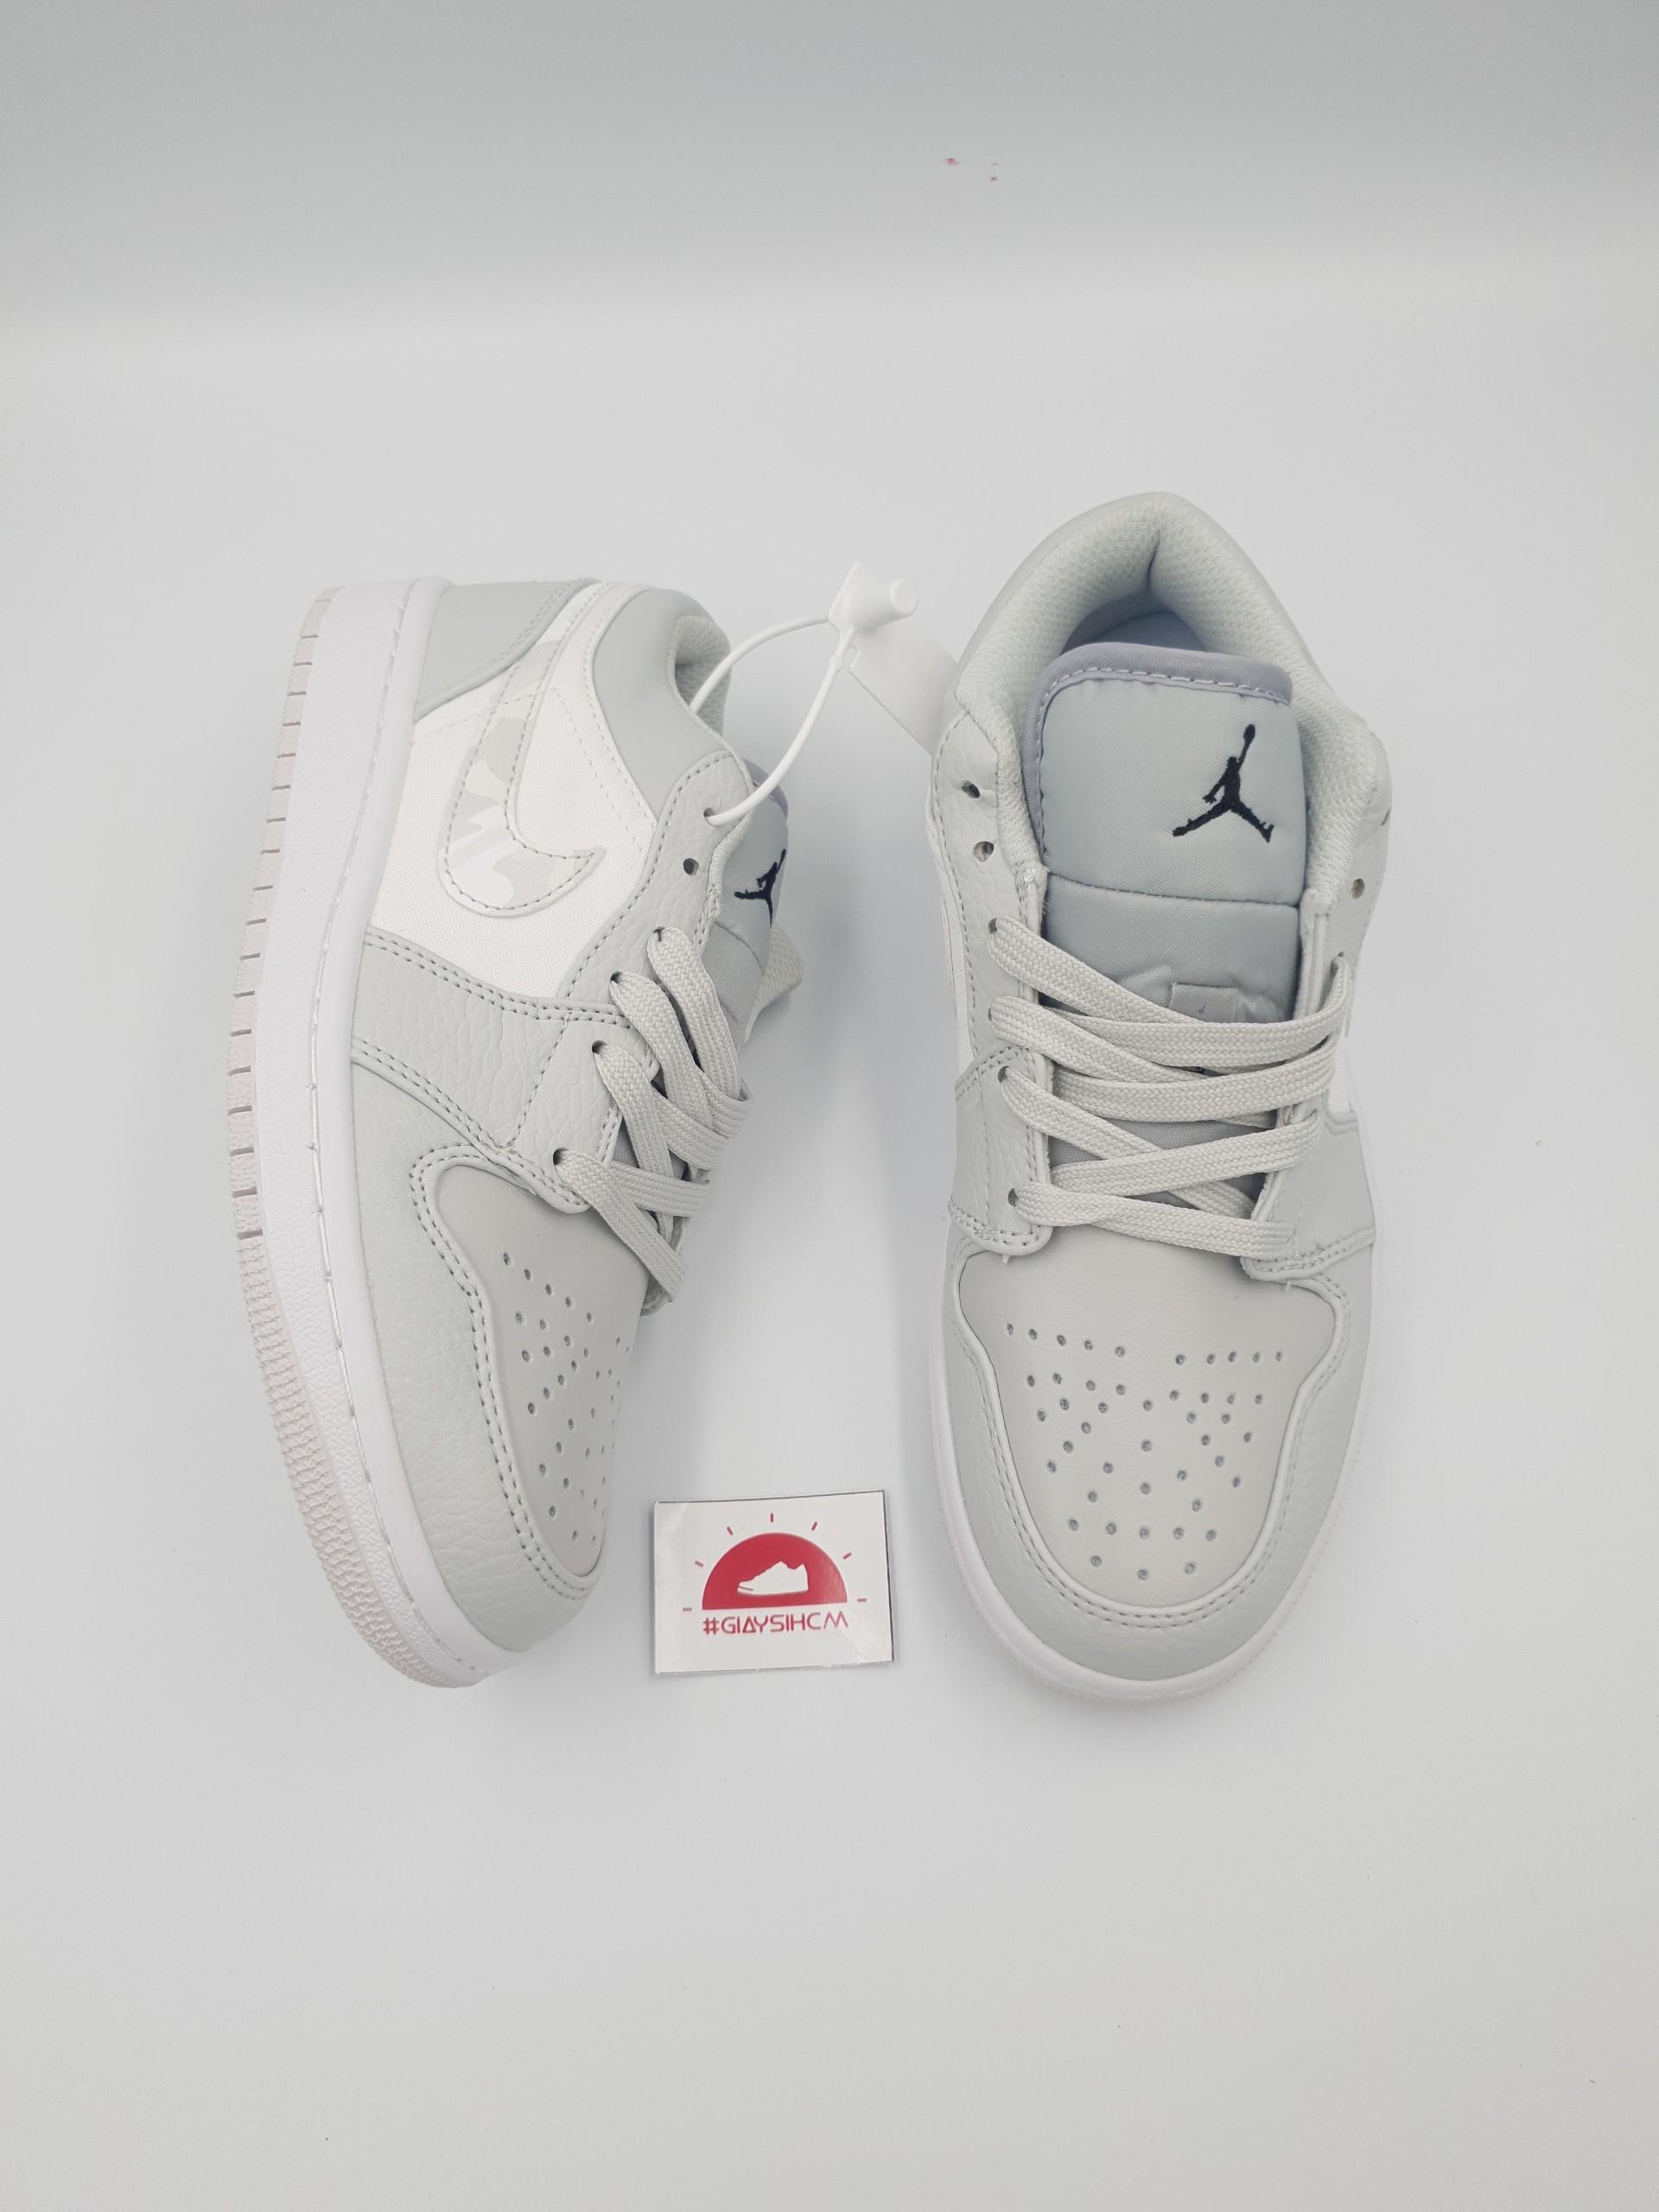 Air-Jordan-1-Low-White-Camo